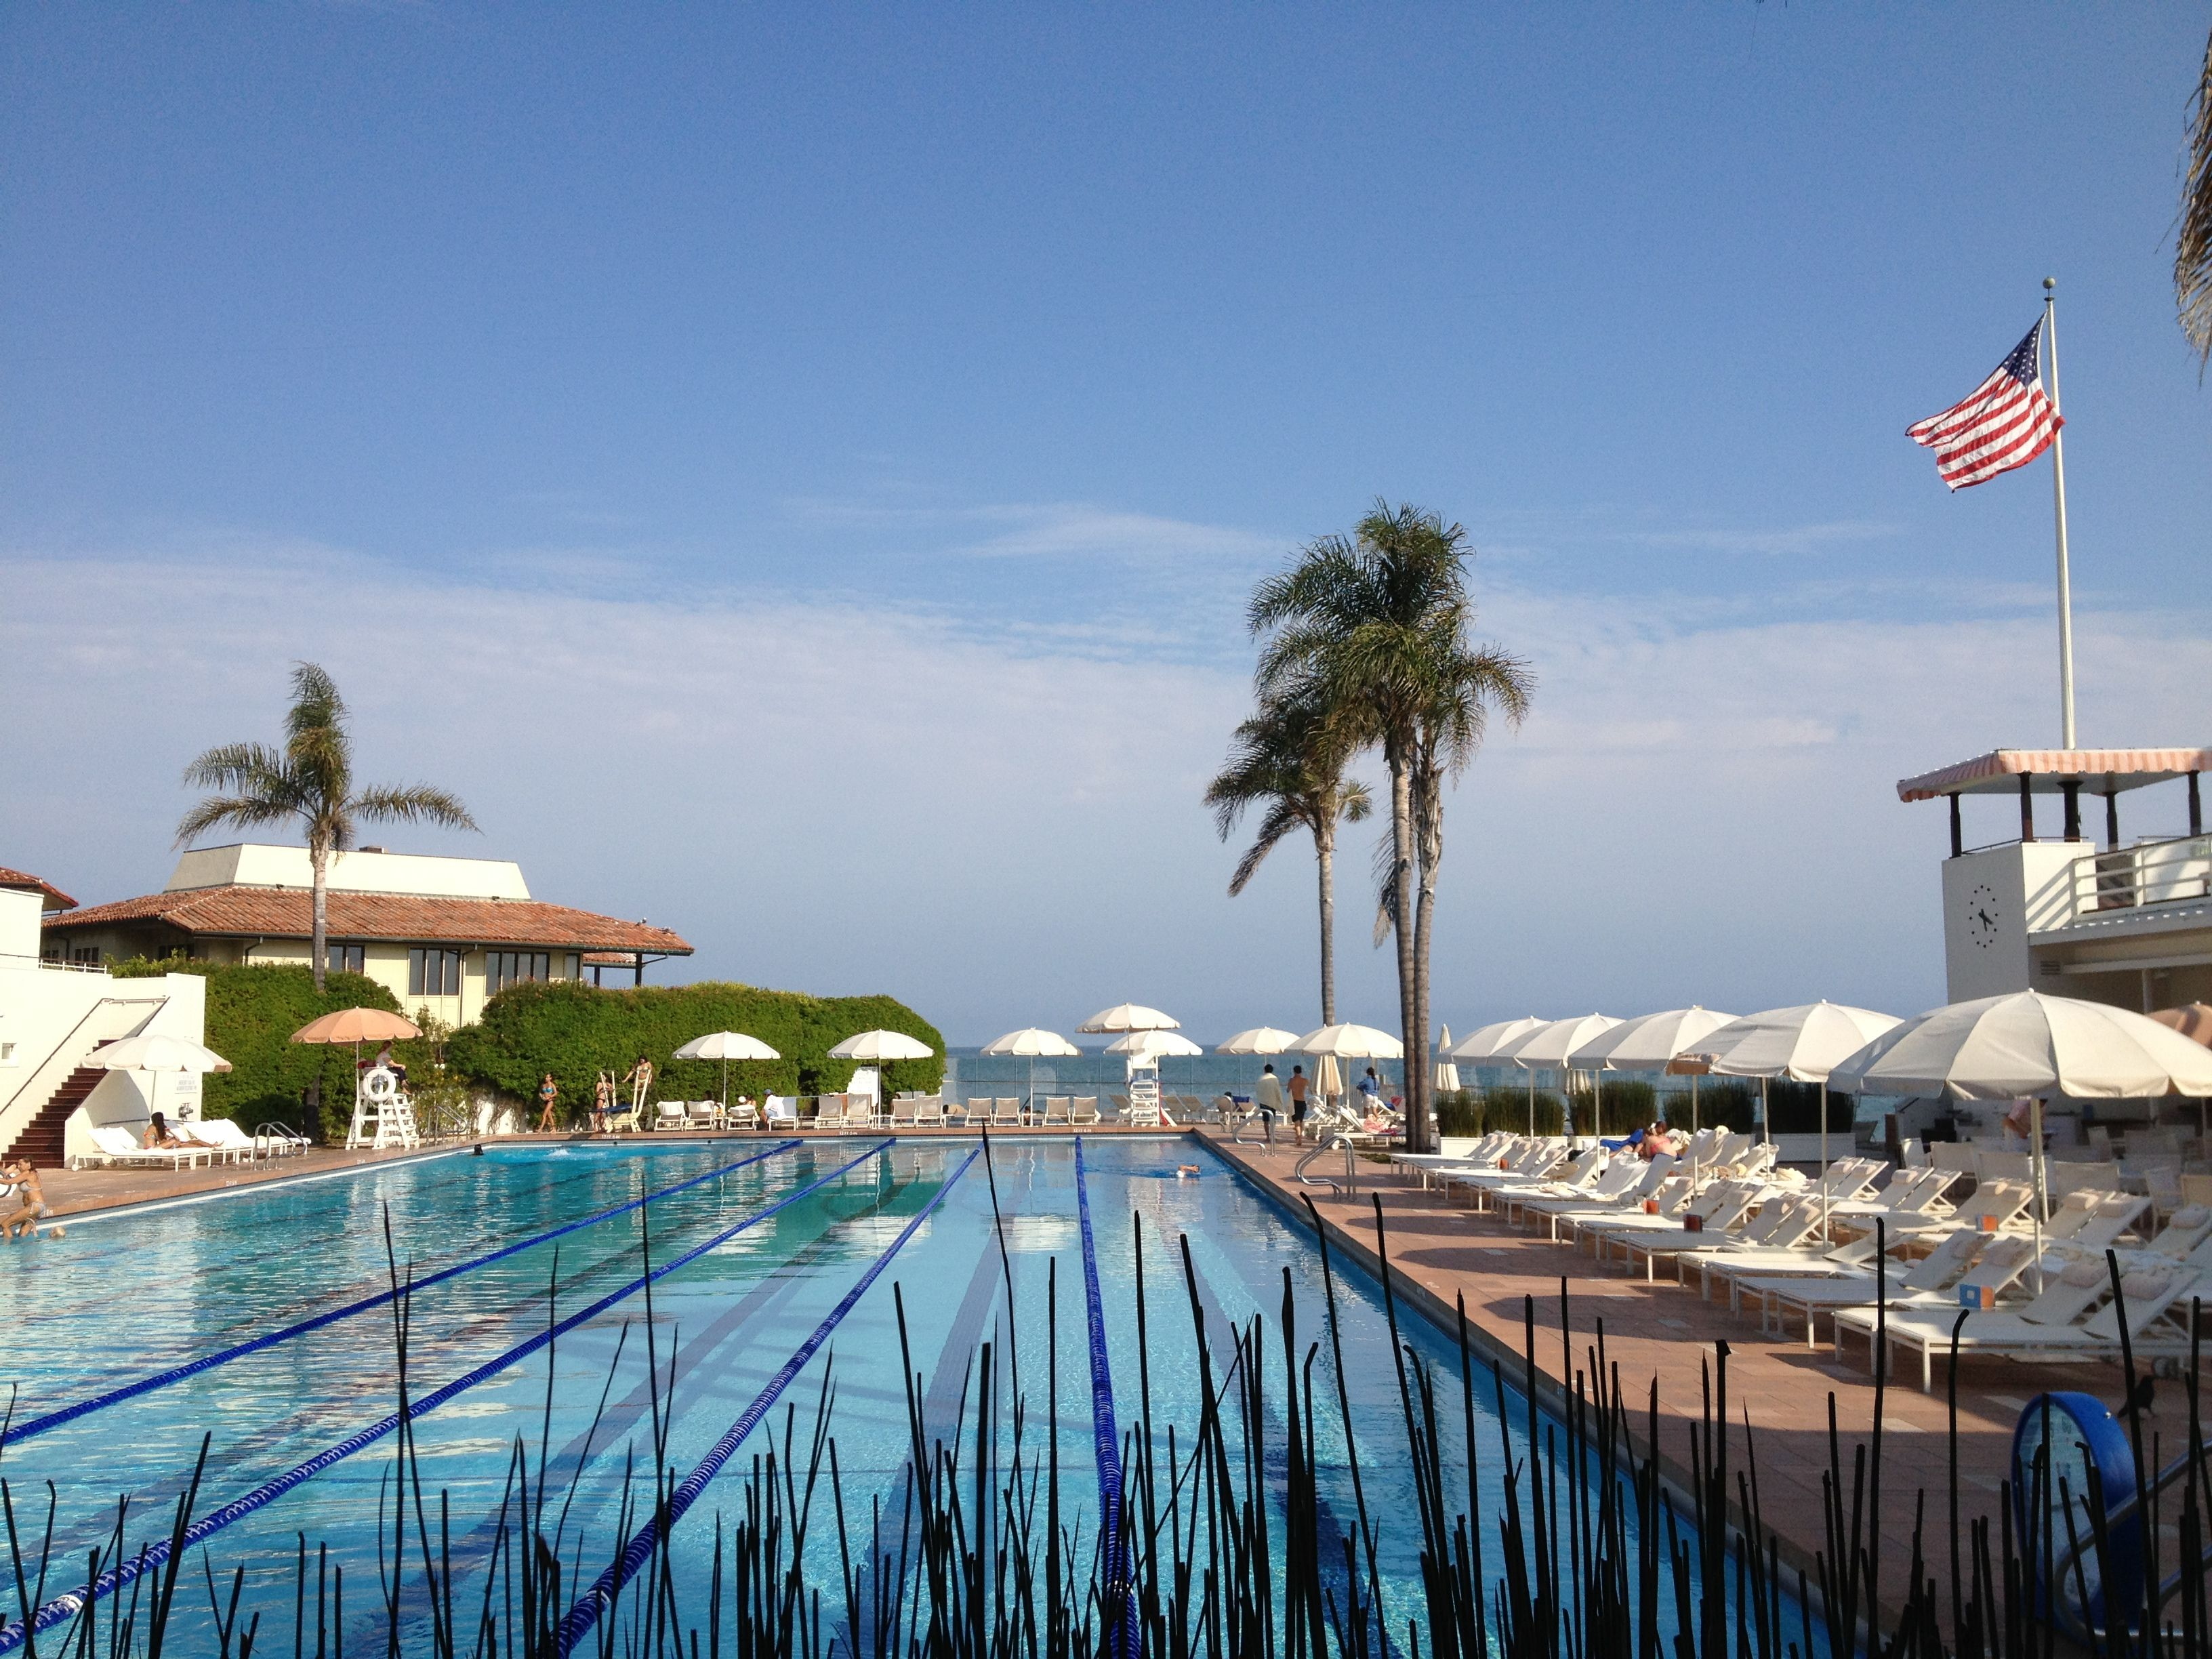 coral casino beach & cabana club santa barbara ca